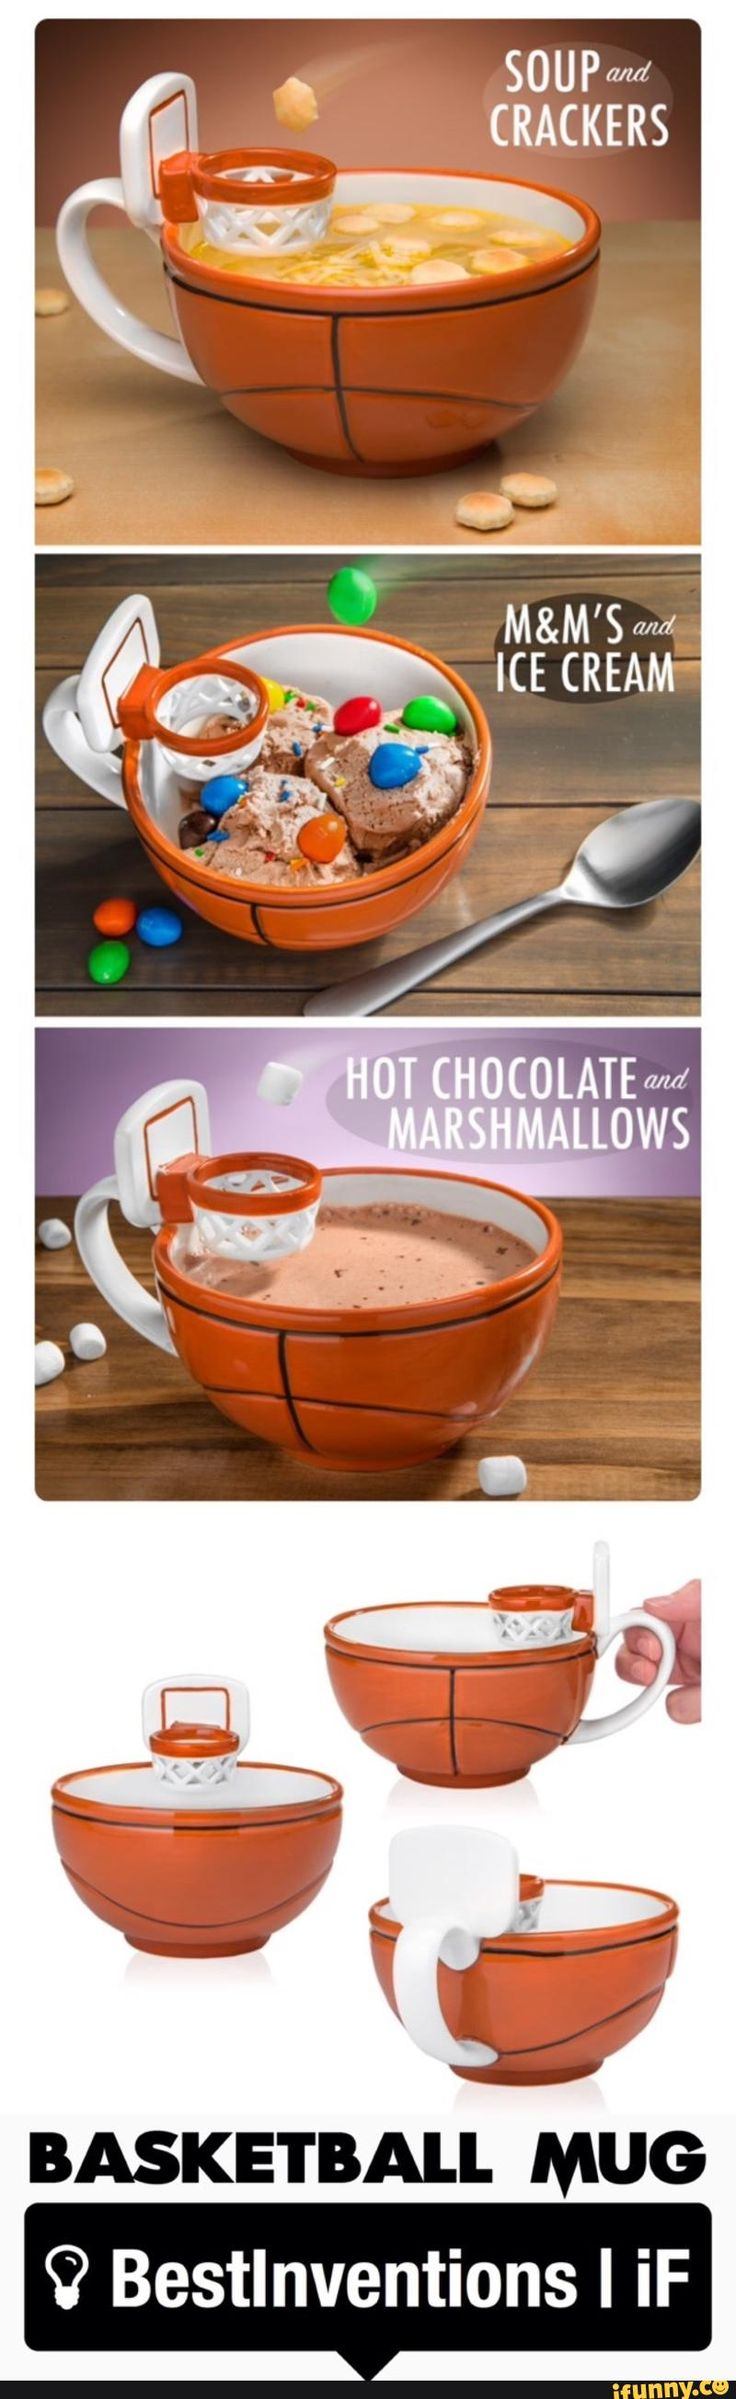 basketball, mug, genius, bestinventions